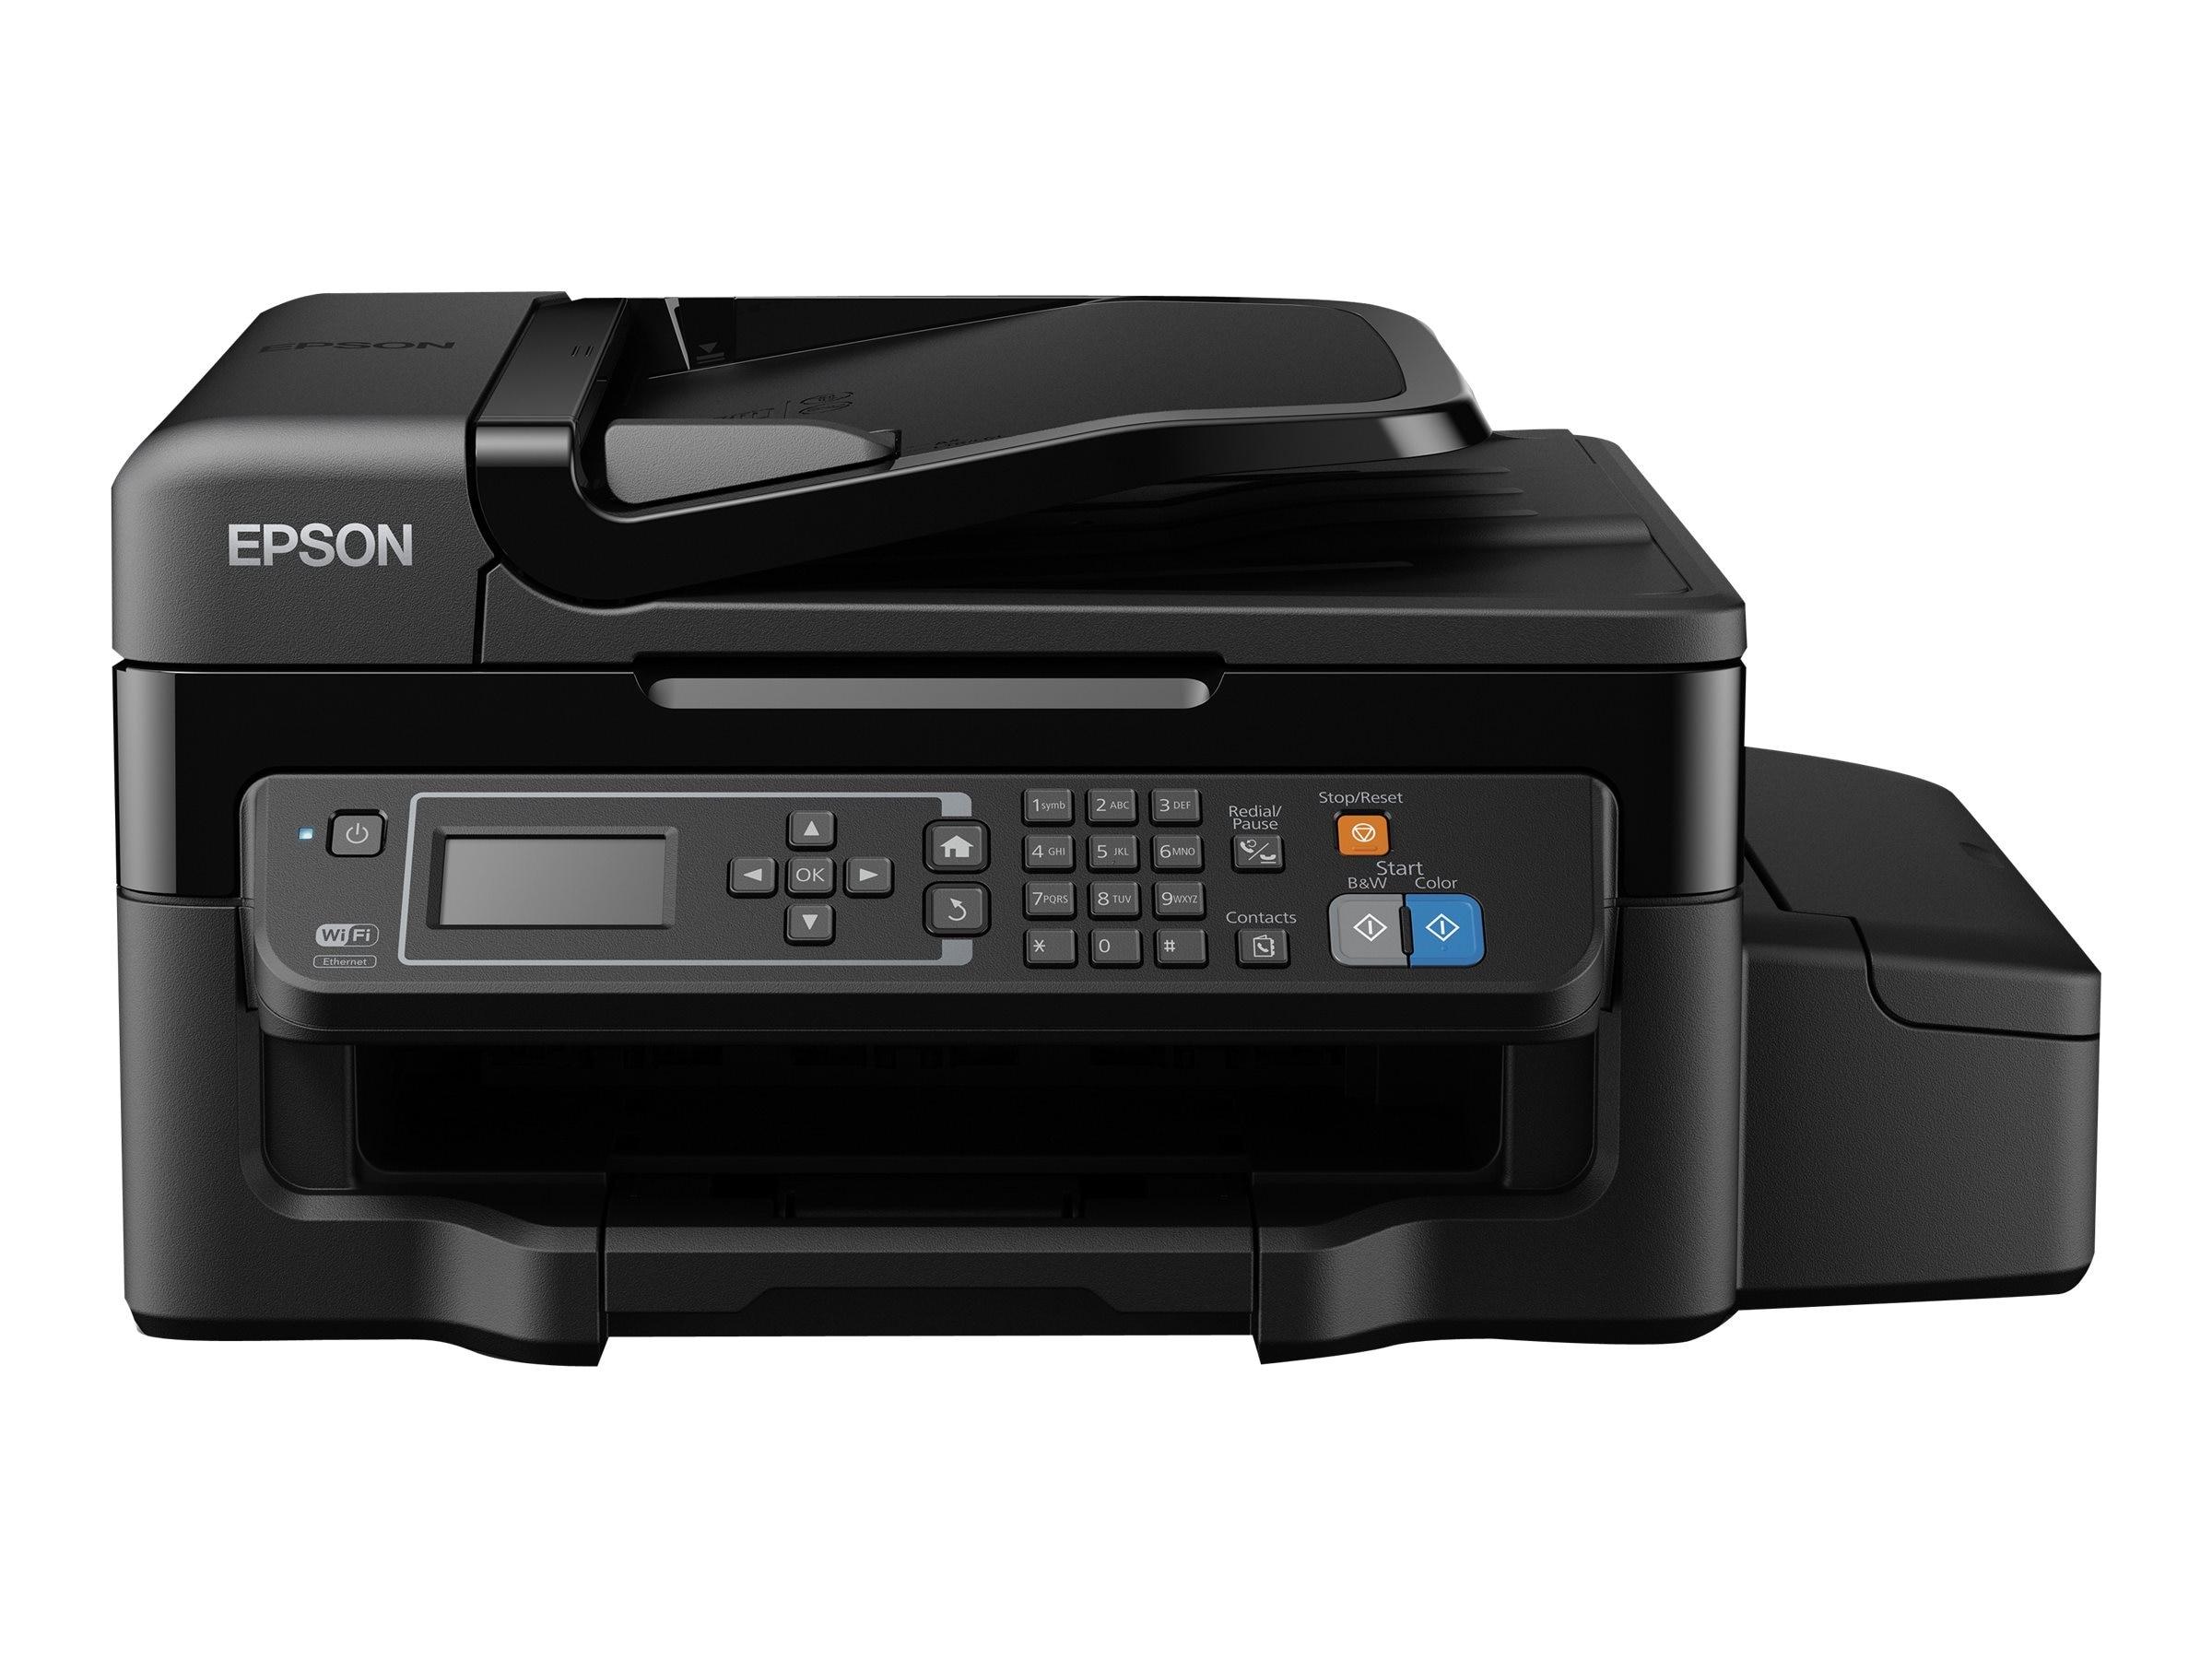 Epson C11CE90201 Image 8